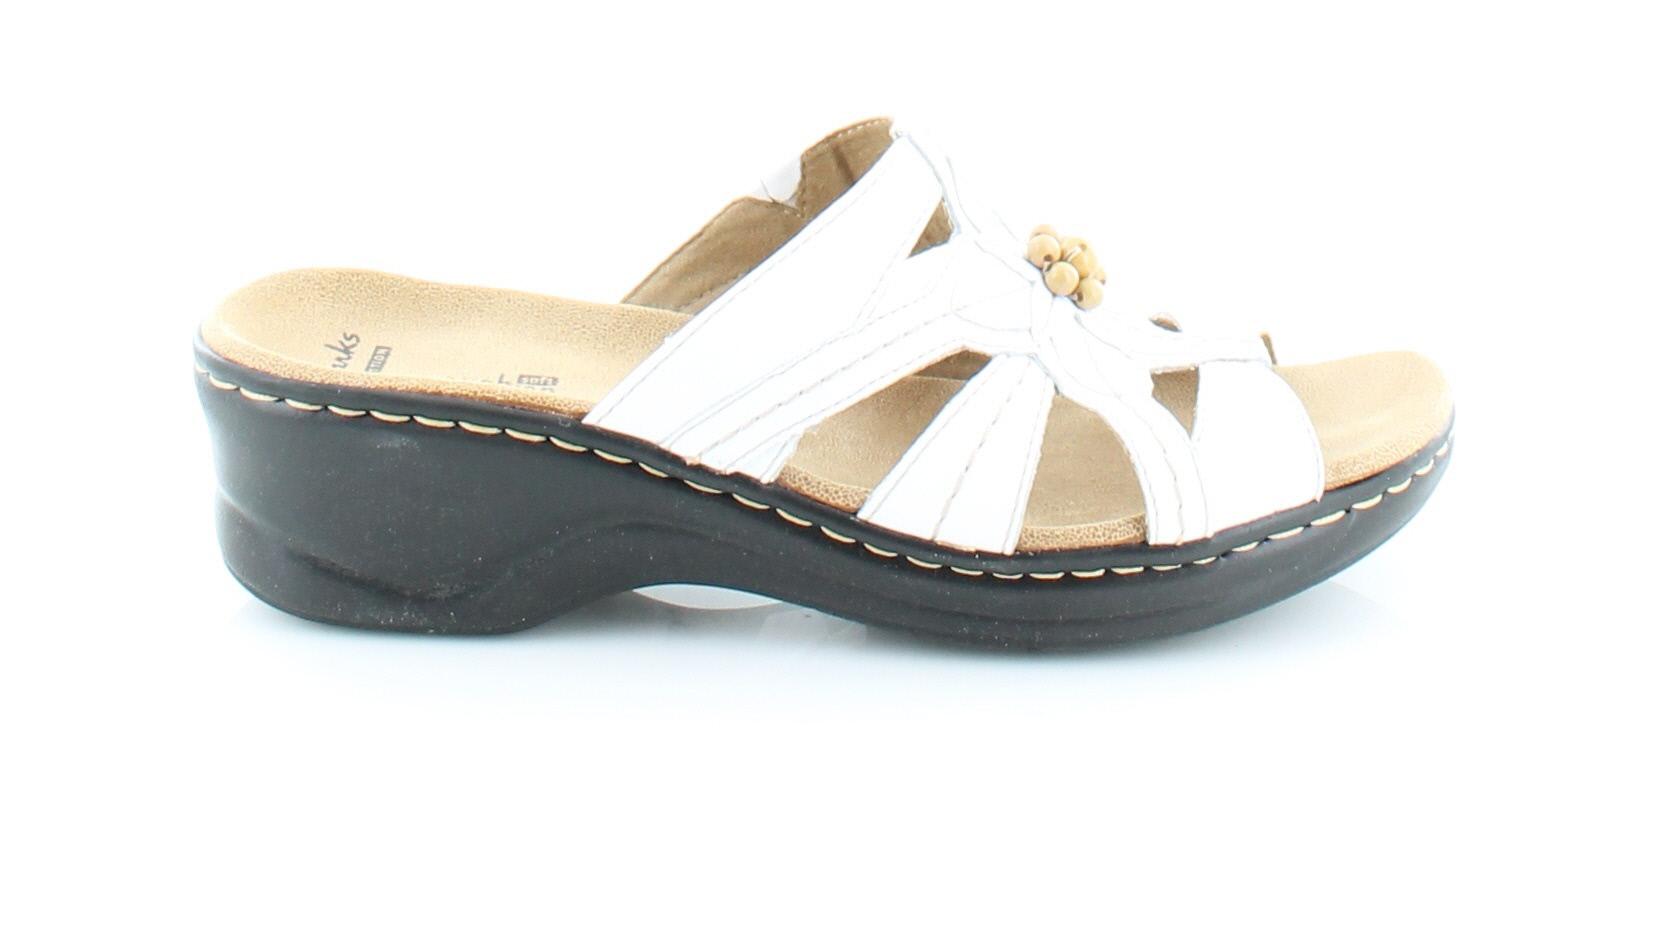 Clarks Lexi Myrtle White Womens Shoes Size 9 N Sandals ...